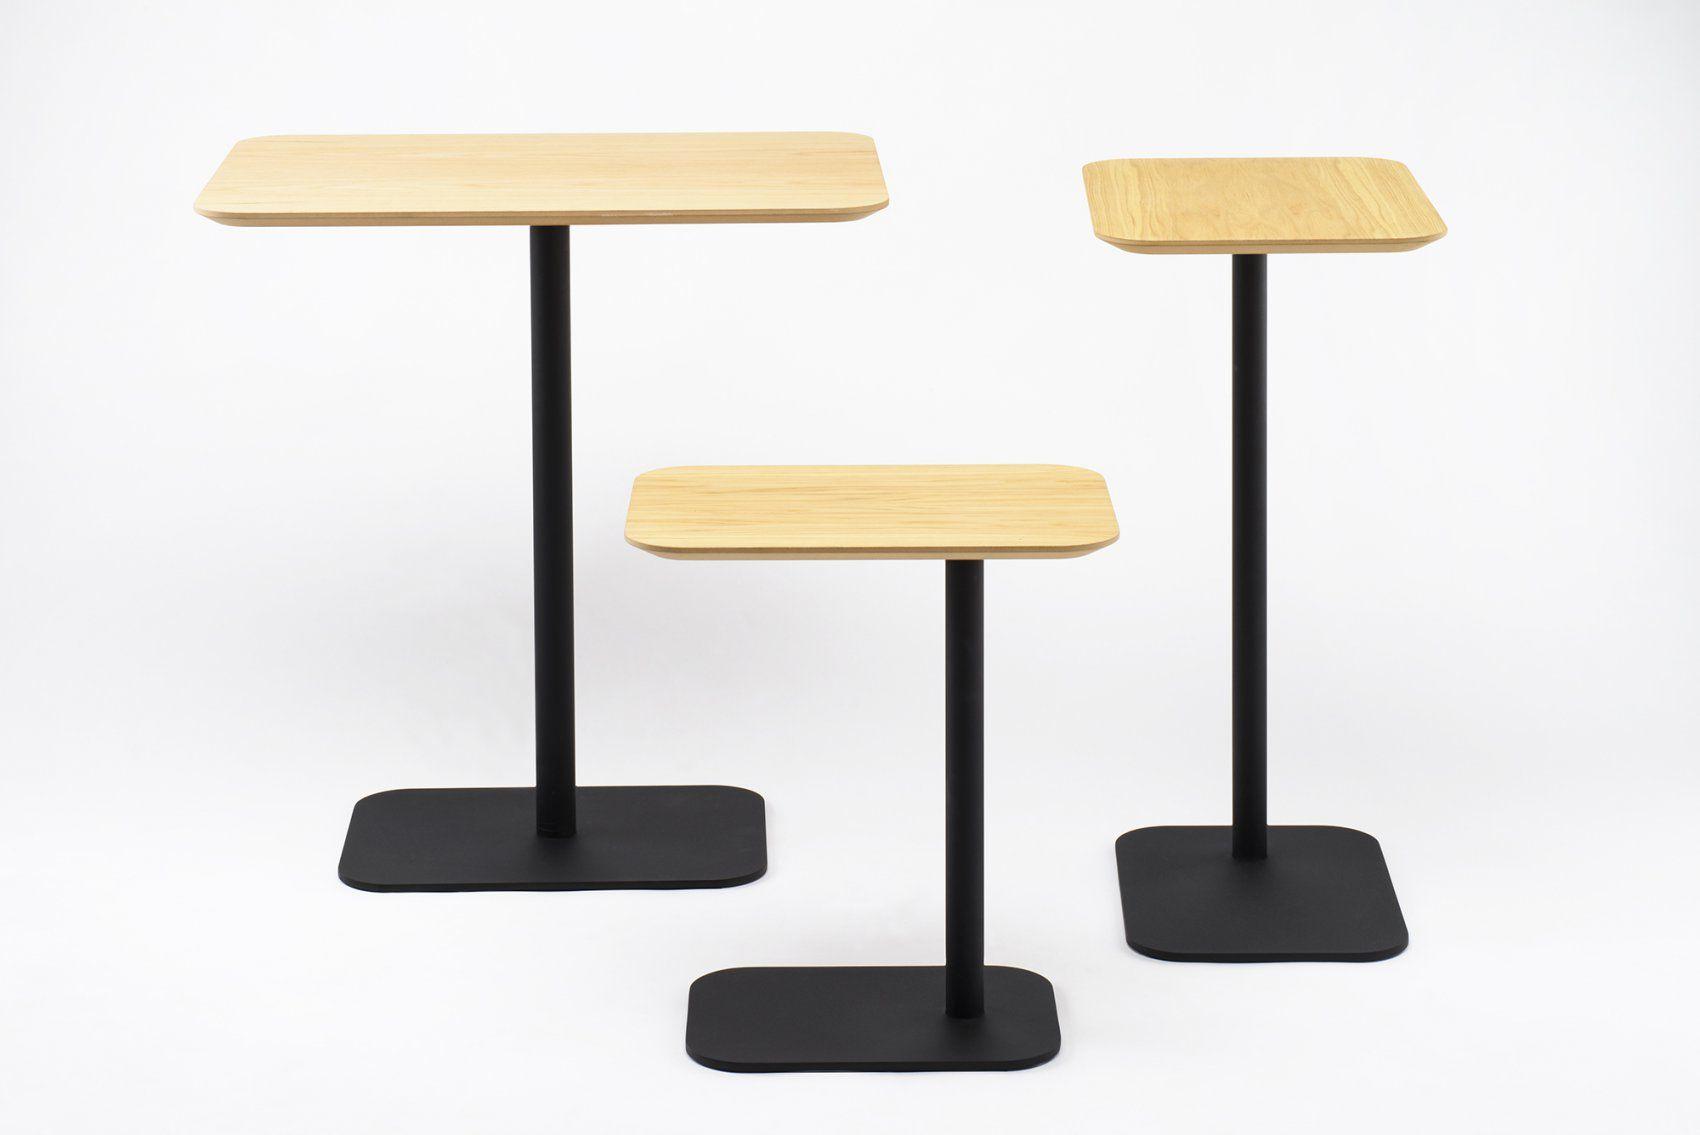 MG-Series-Side-Table-De-Vorm-Arnhem-Sofa | Tables \u0026 Desks ...